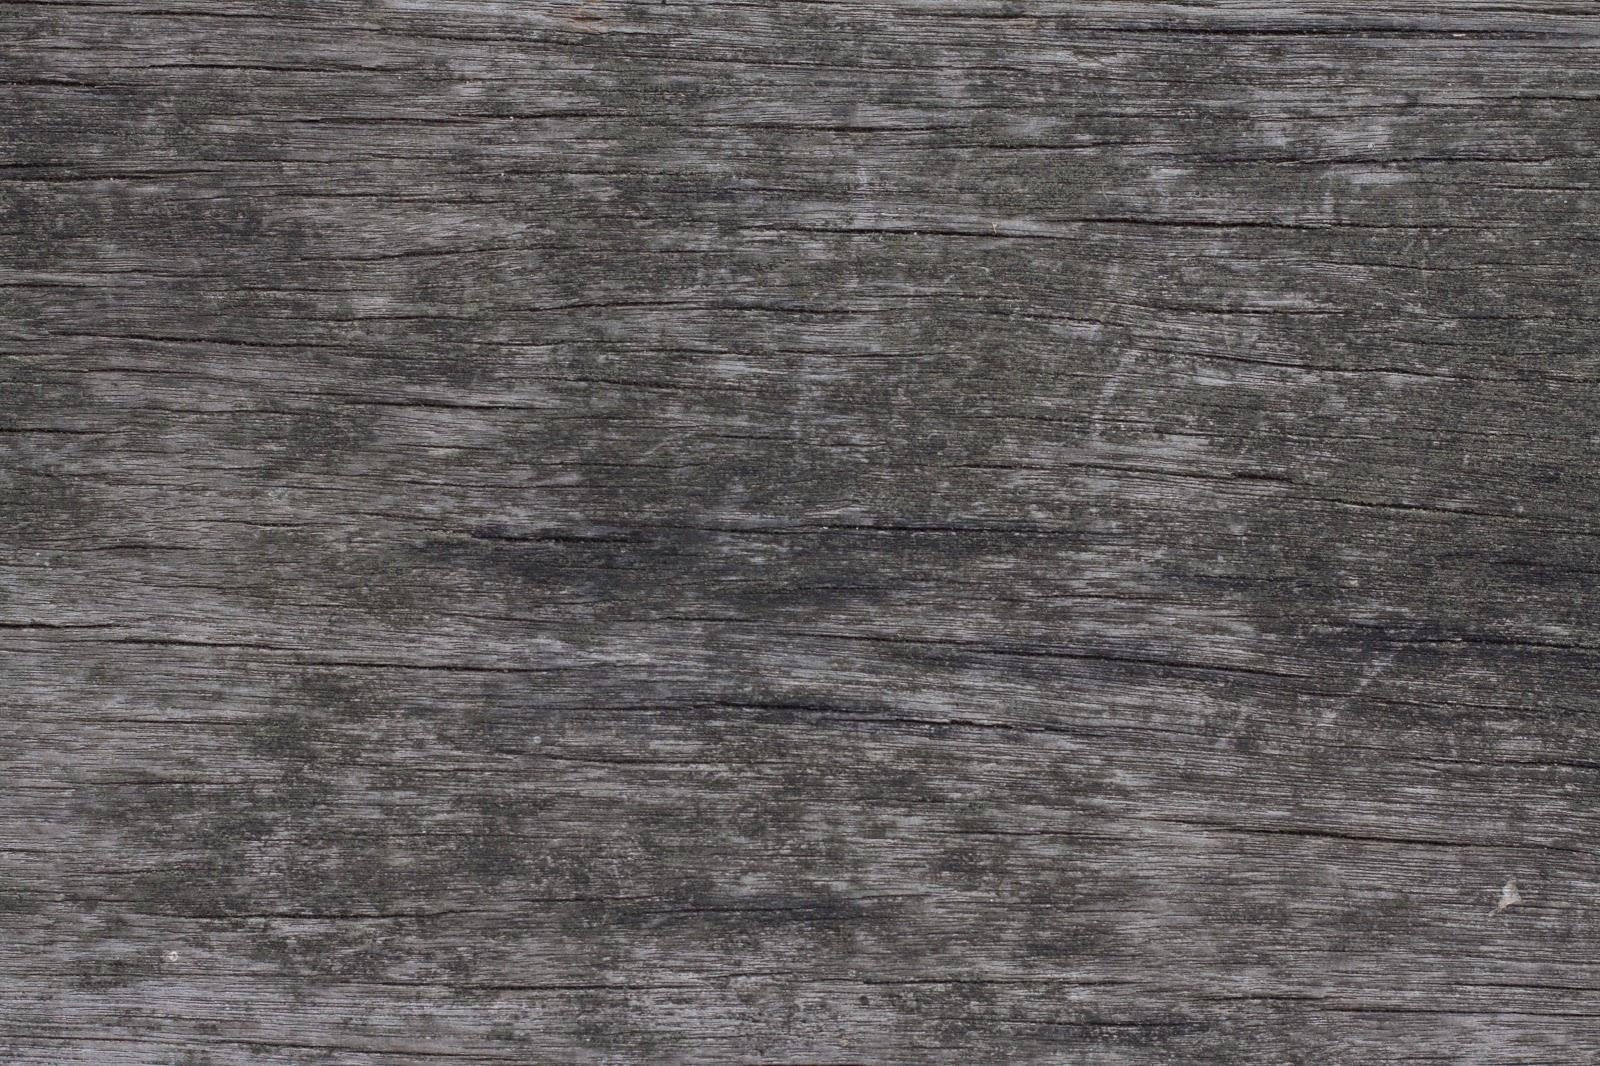 Wood dry cracked bench plank tree bark texture ver 19